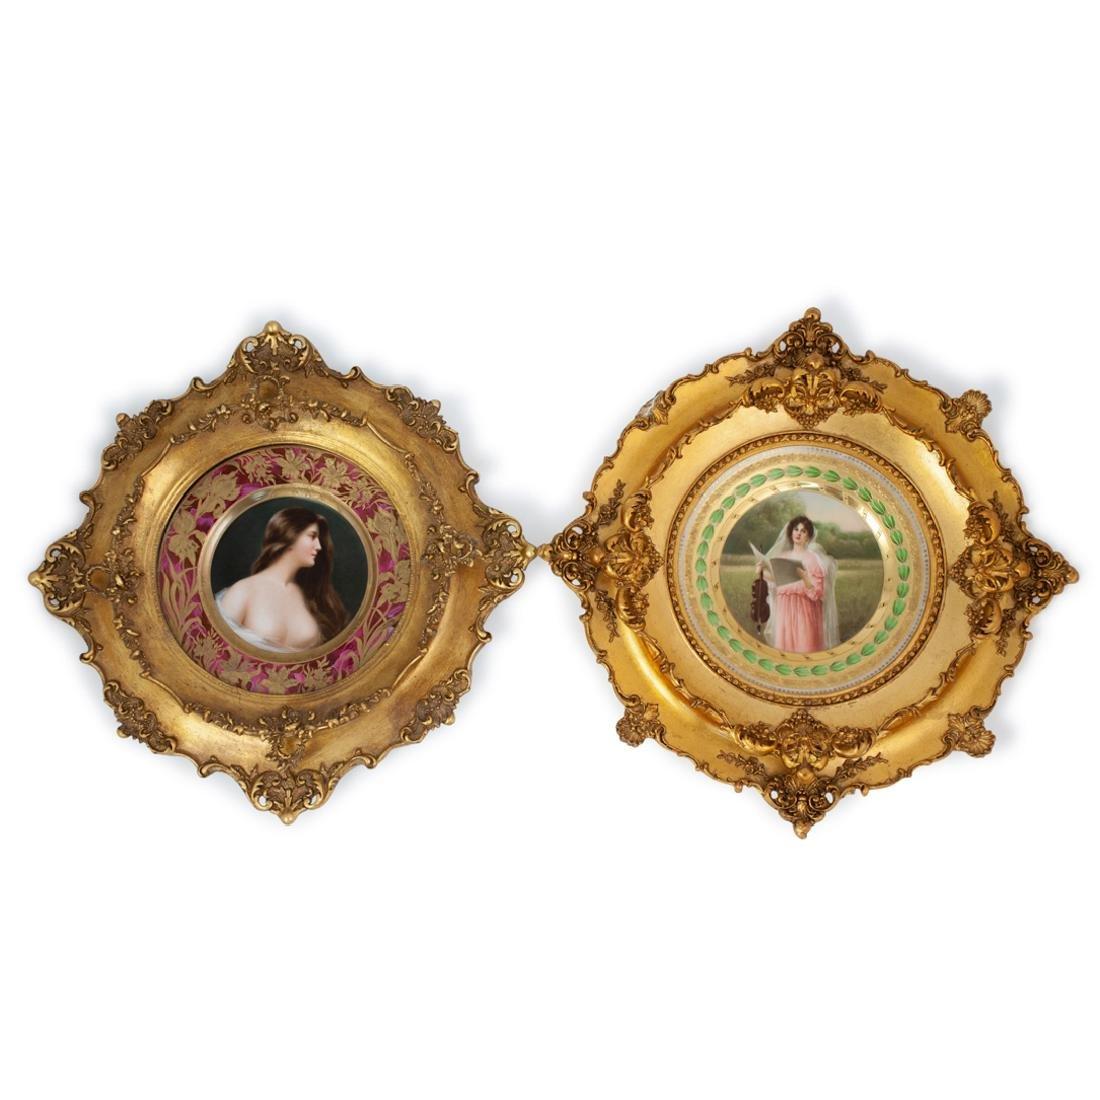 (2 Pc) Royal Vienna Porcelain Plates